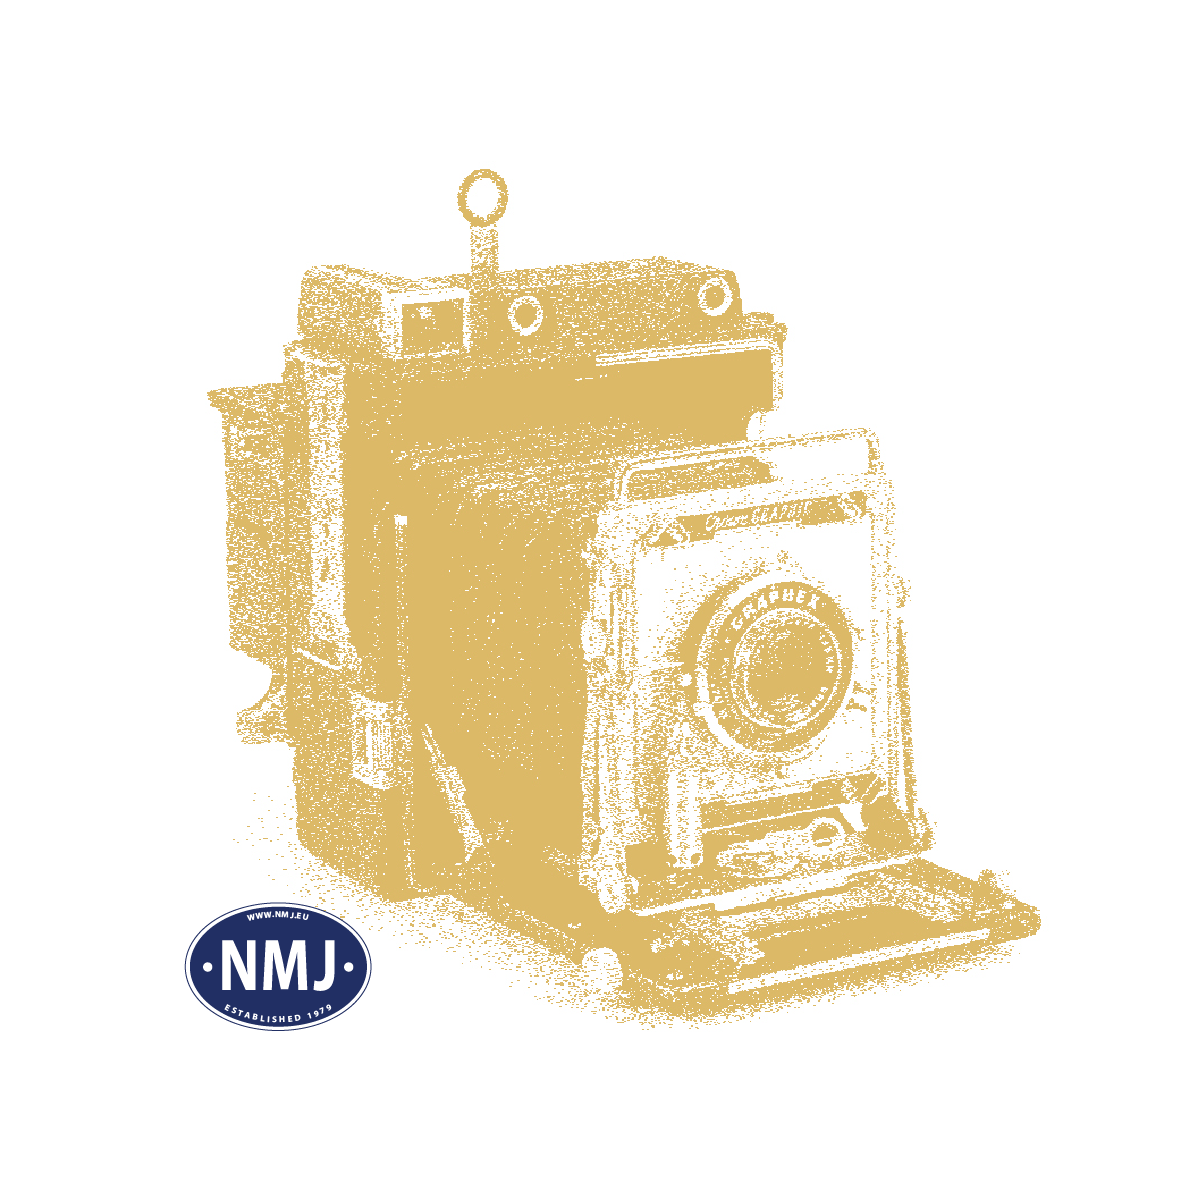 GMKAL20 - Nohab GM Kalender 2020, A3 Format